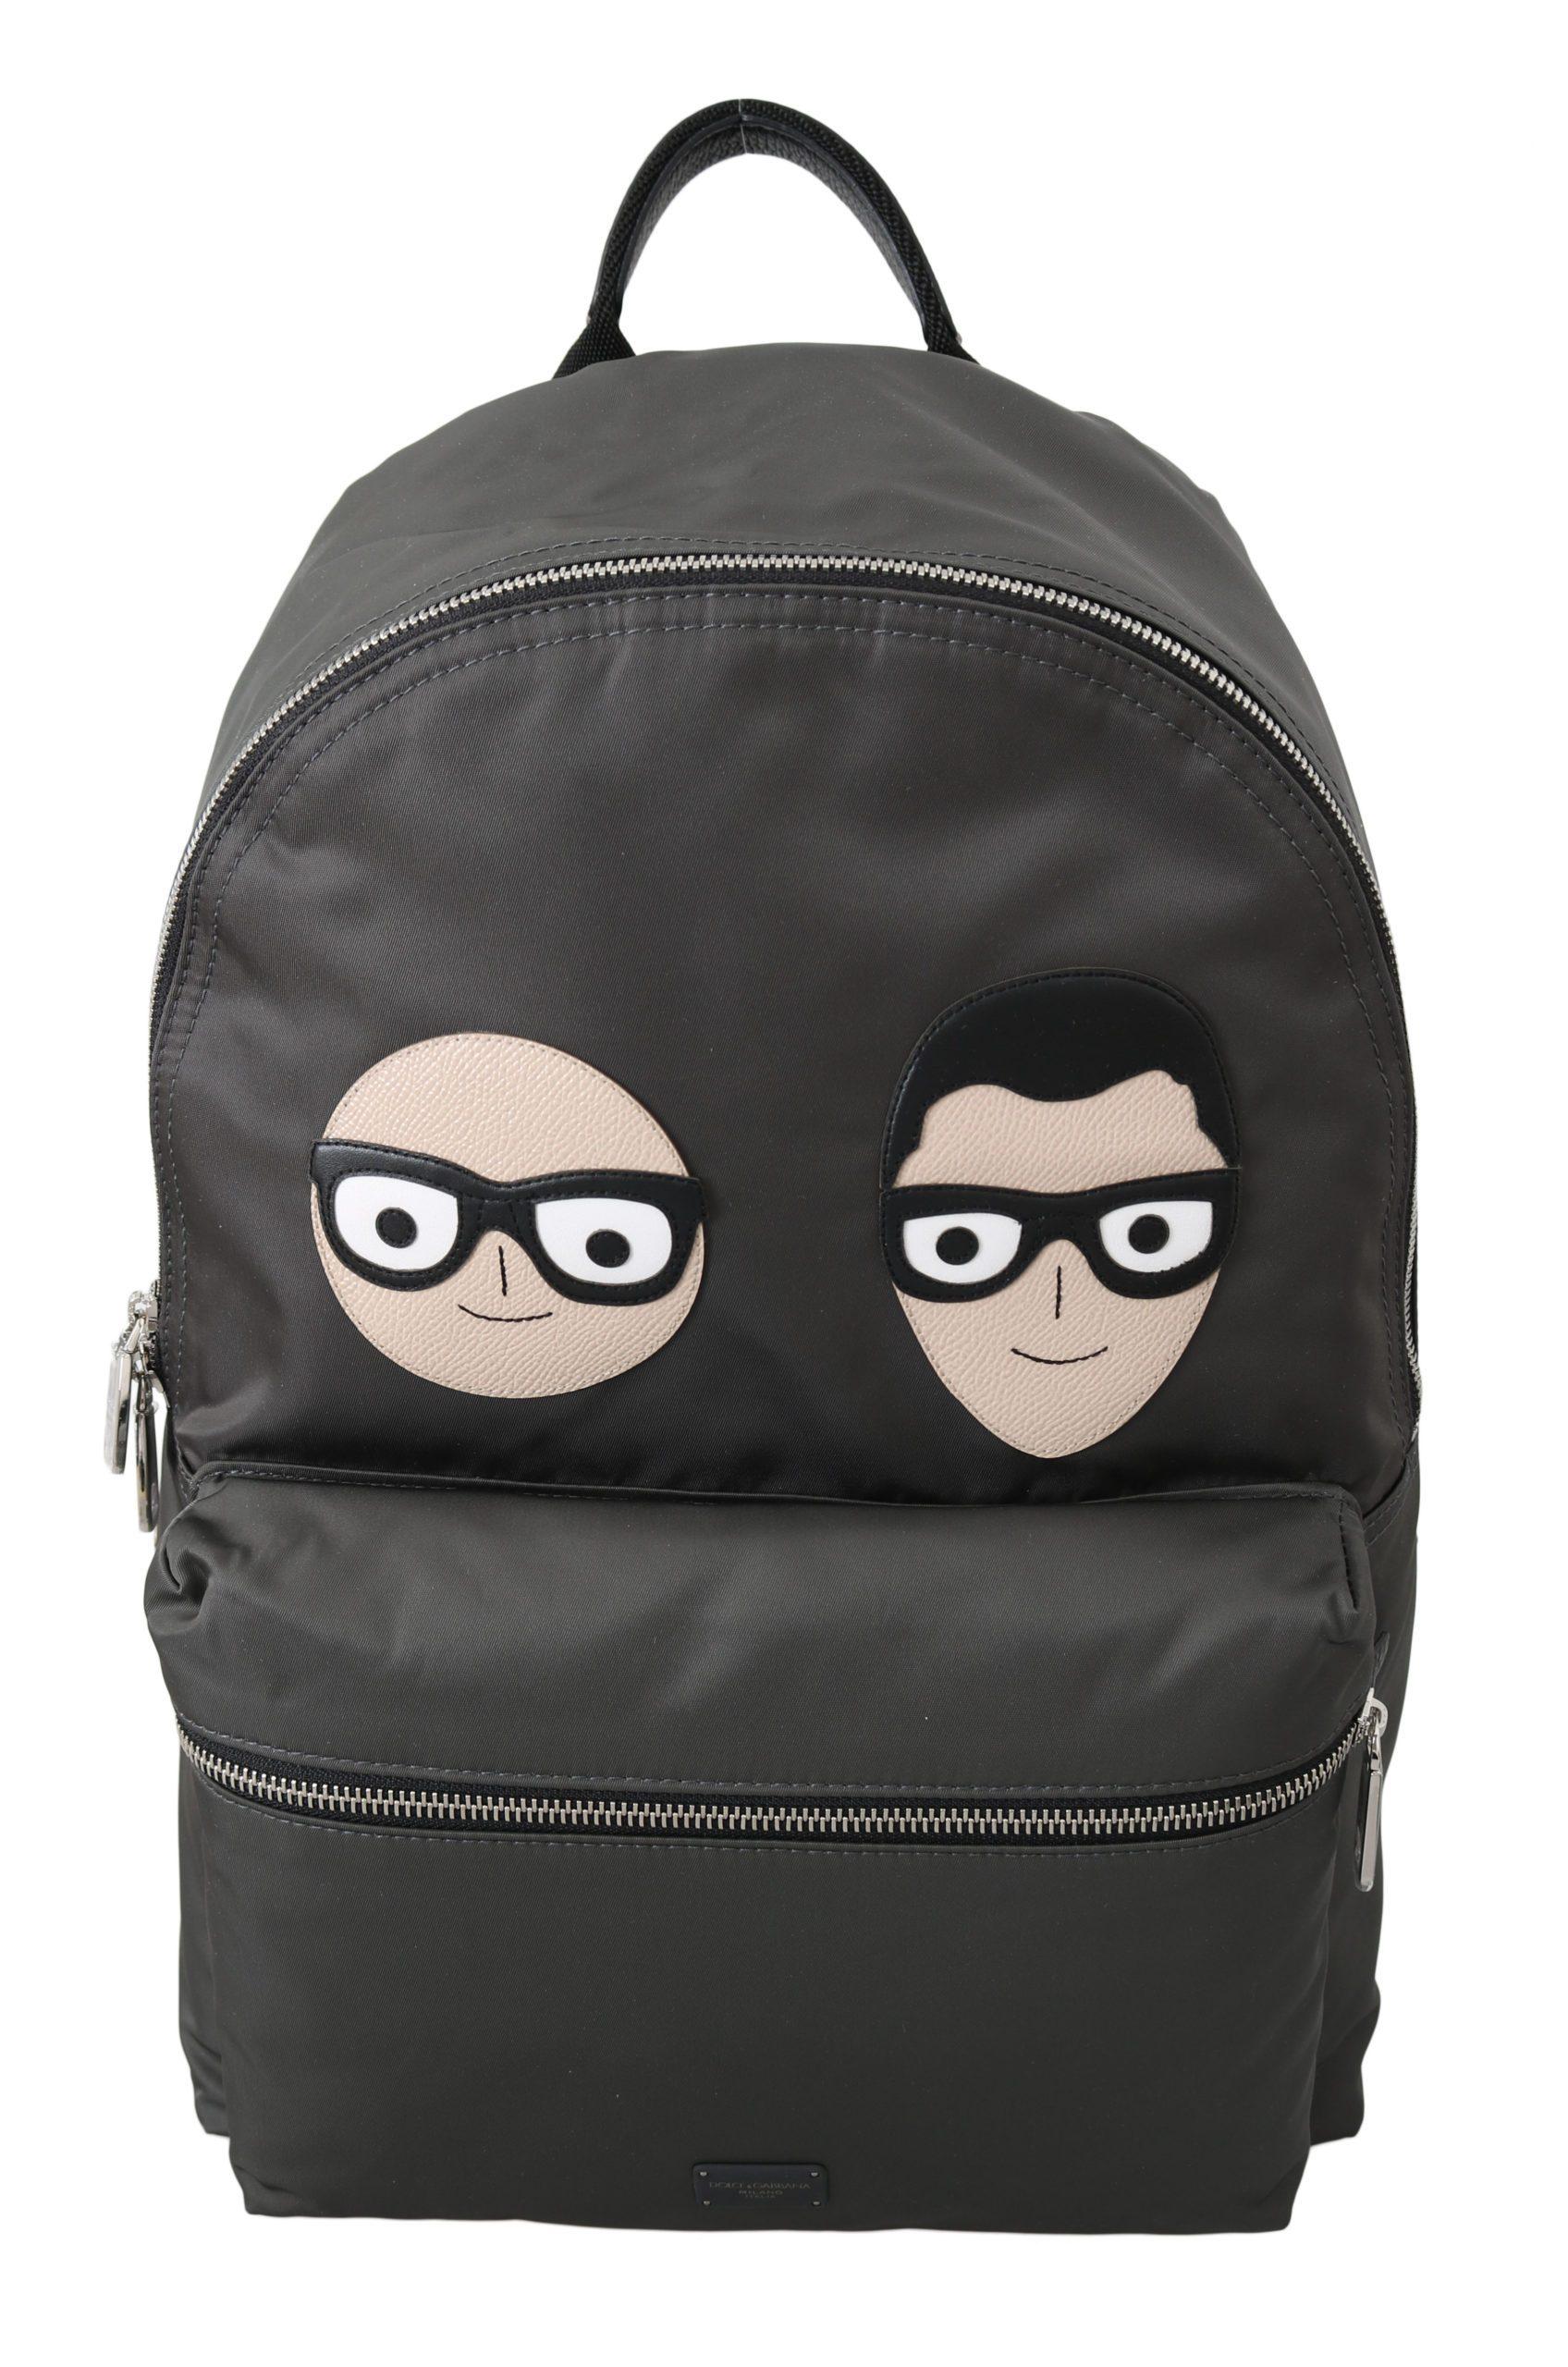 Dolce & Gabbana Men's Patch Casual School Backpack Gray VA8654